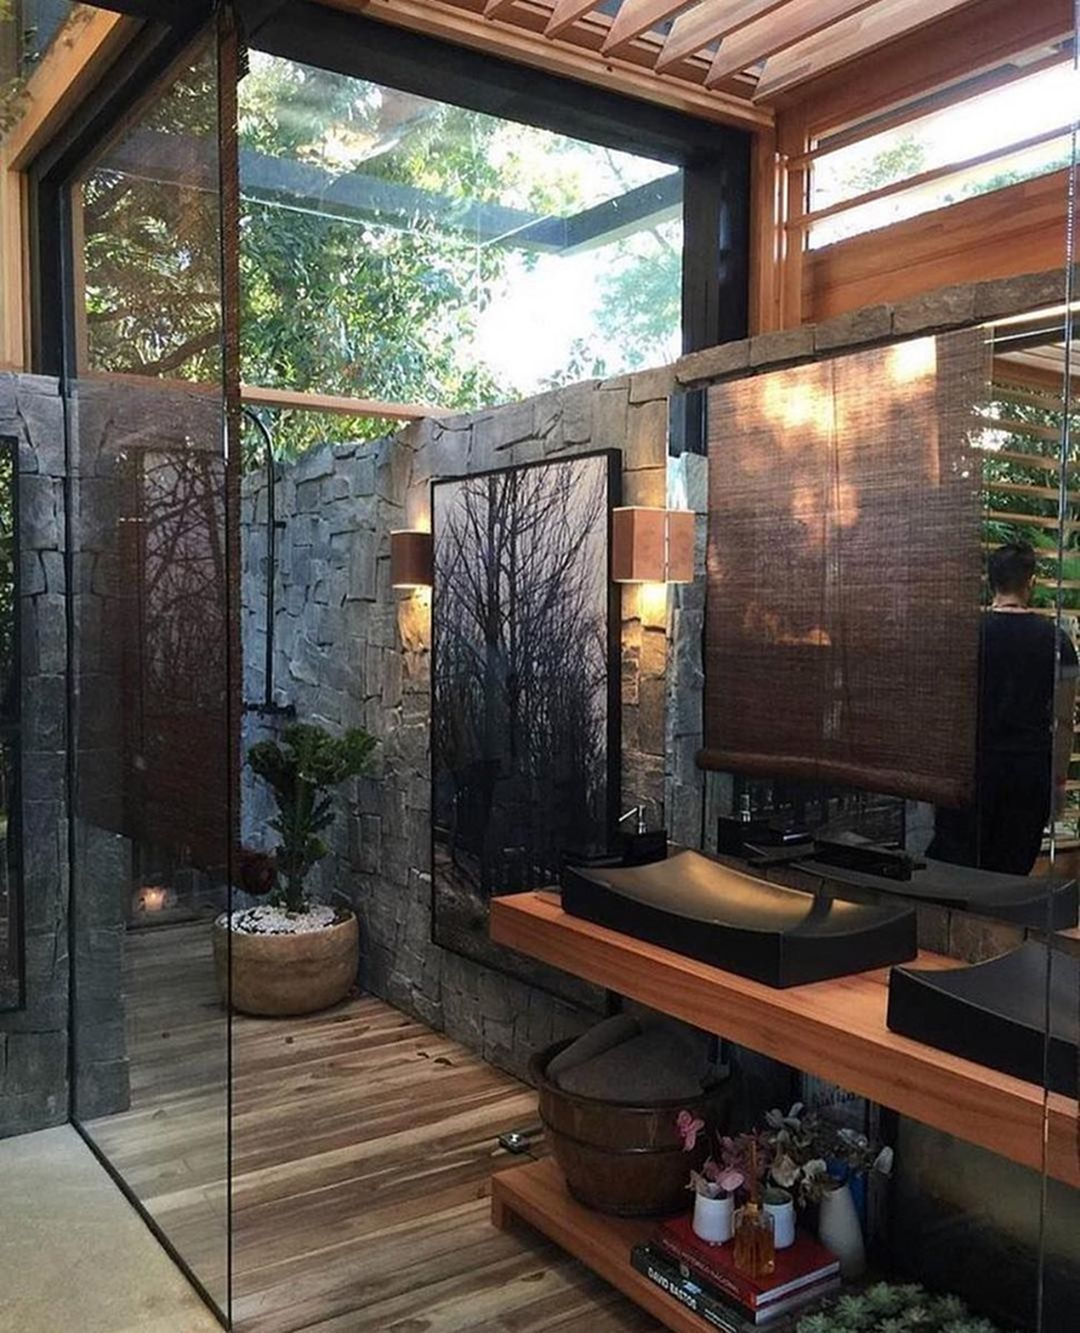 Top 33 Extraordinary Outdoor Bathroom Designs For Relax And Enjoyable Bathing Ideas Http Creative Bathroom Design Bathroom Design Inspiration Outdoor Bathrooms